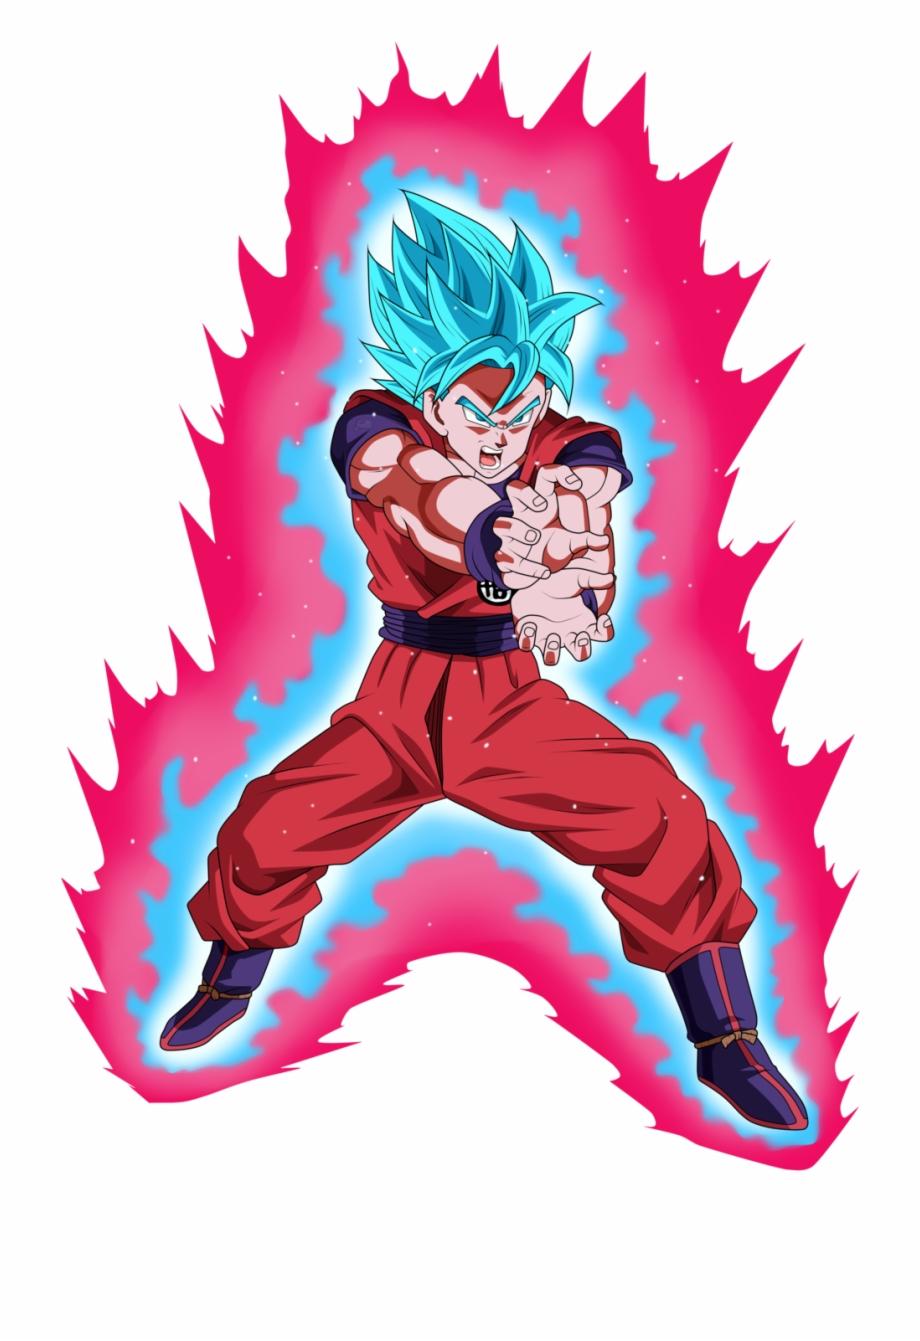 Goku Clipart Super Saiyan God Imagenes De Goku Ssj Blue Kaioken